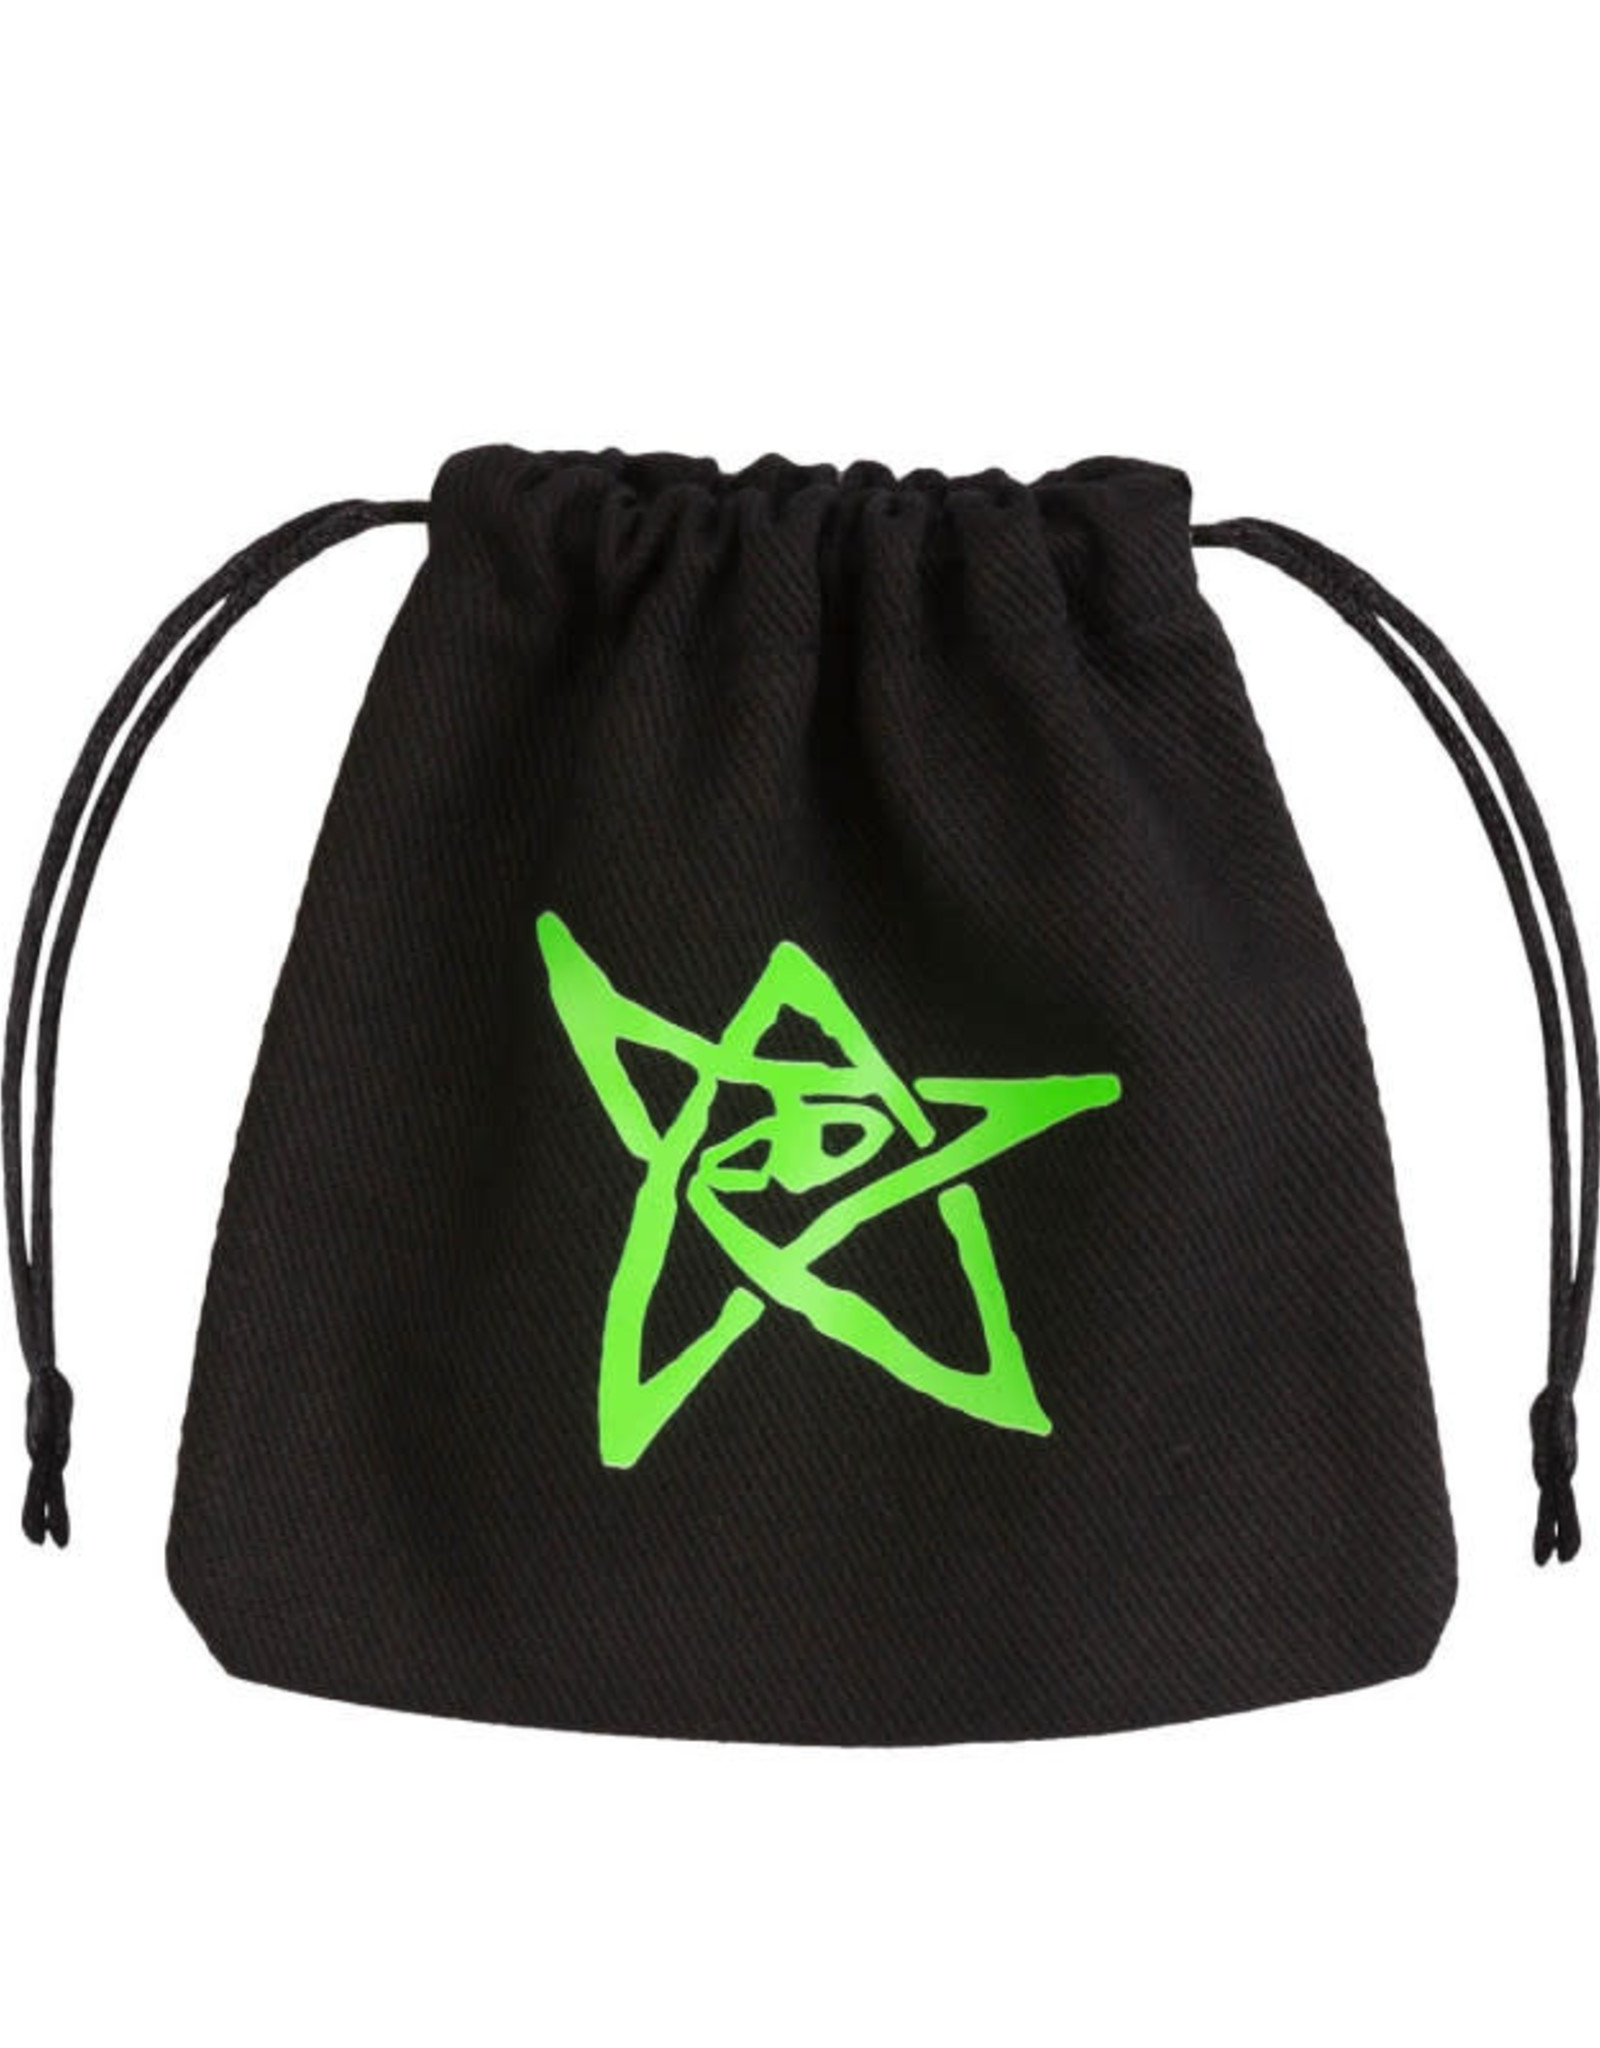 Q Workshop Dice Bag: Call of Cthulhu Black